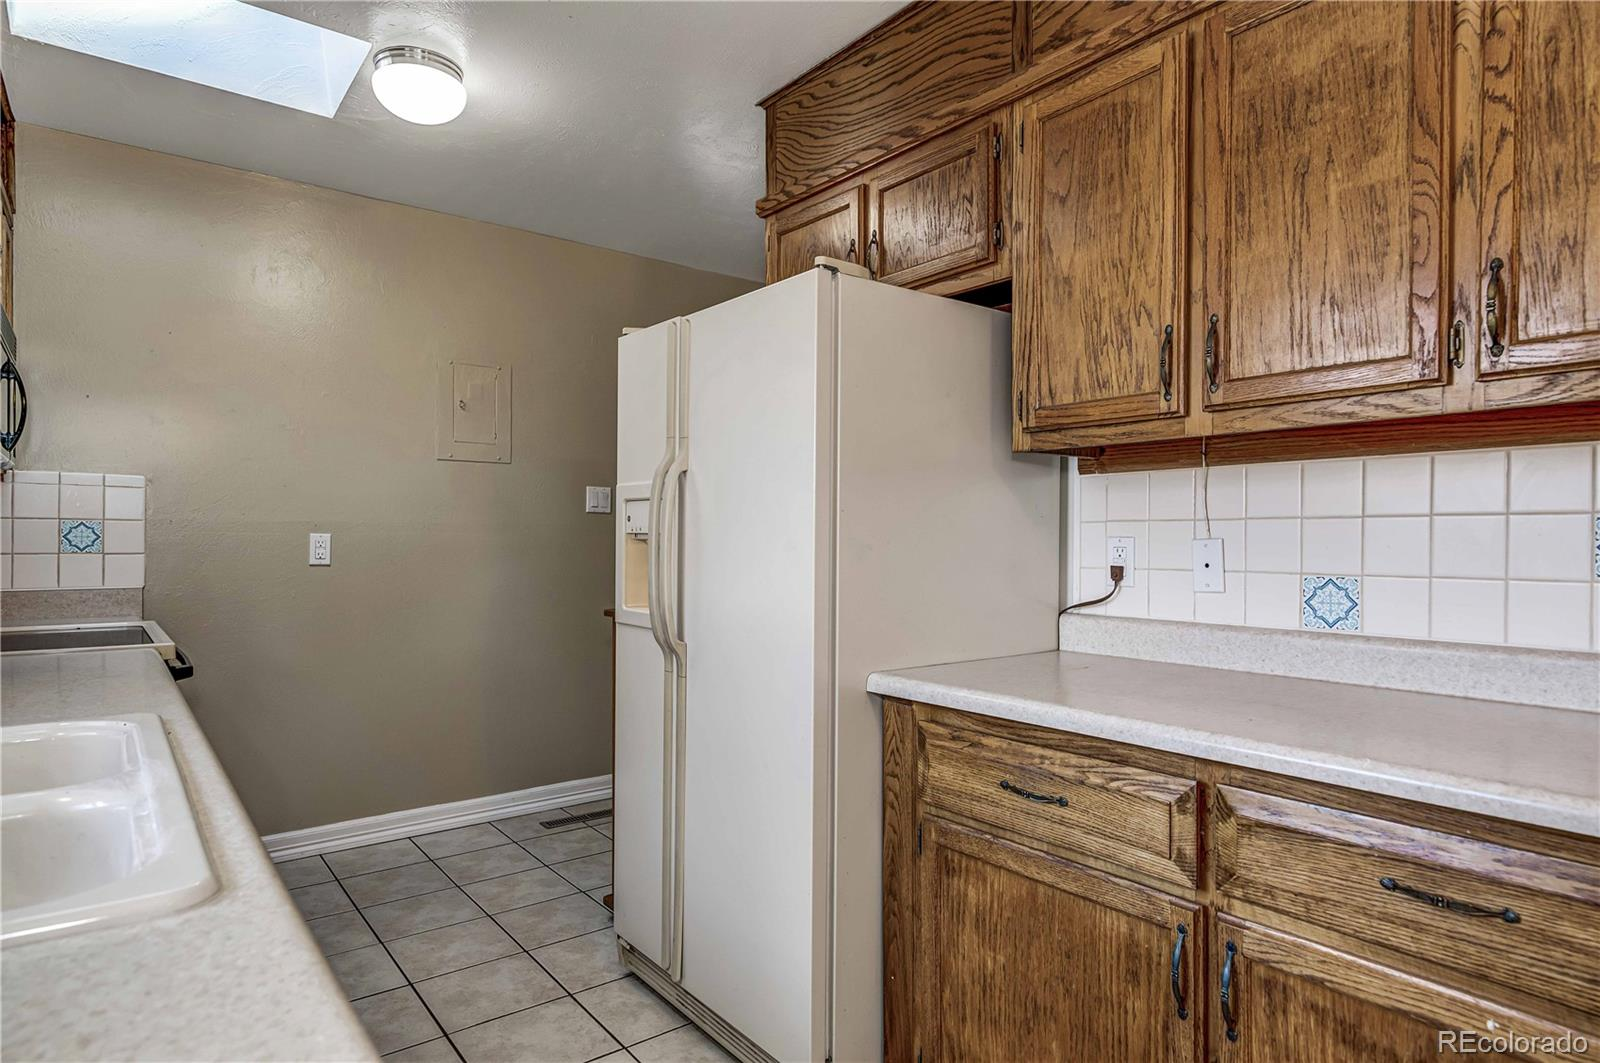 MLS# 5043109 - 13 - 1832 Northview Drive, Colorado Springs, CO 80909